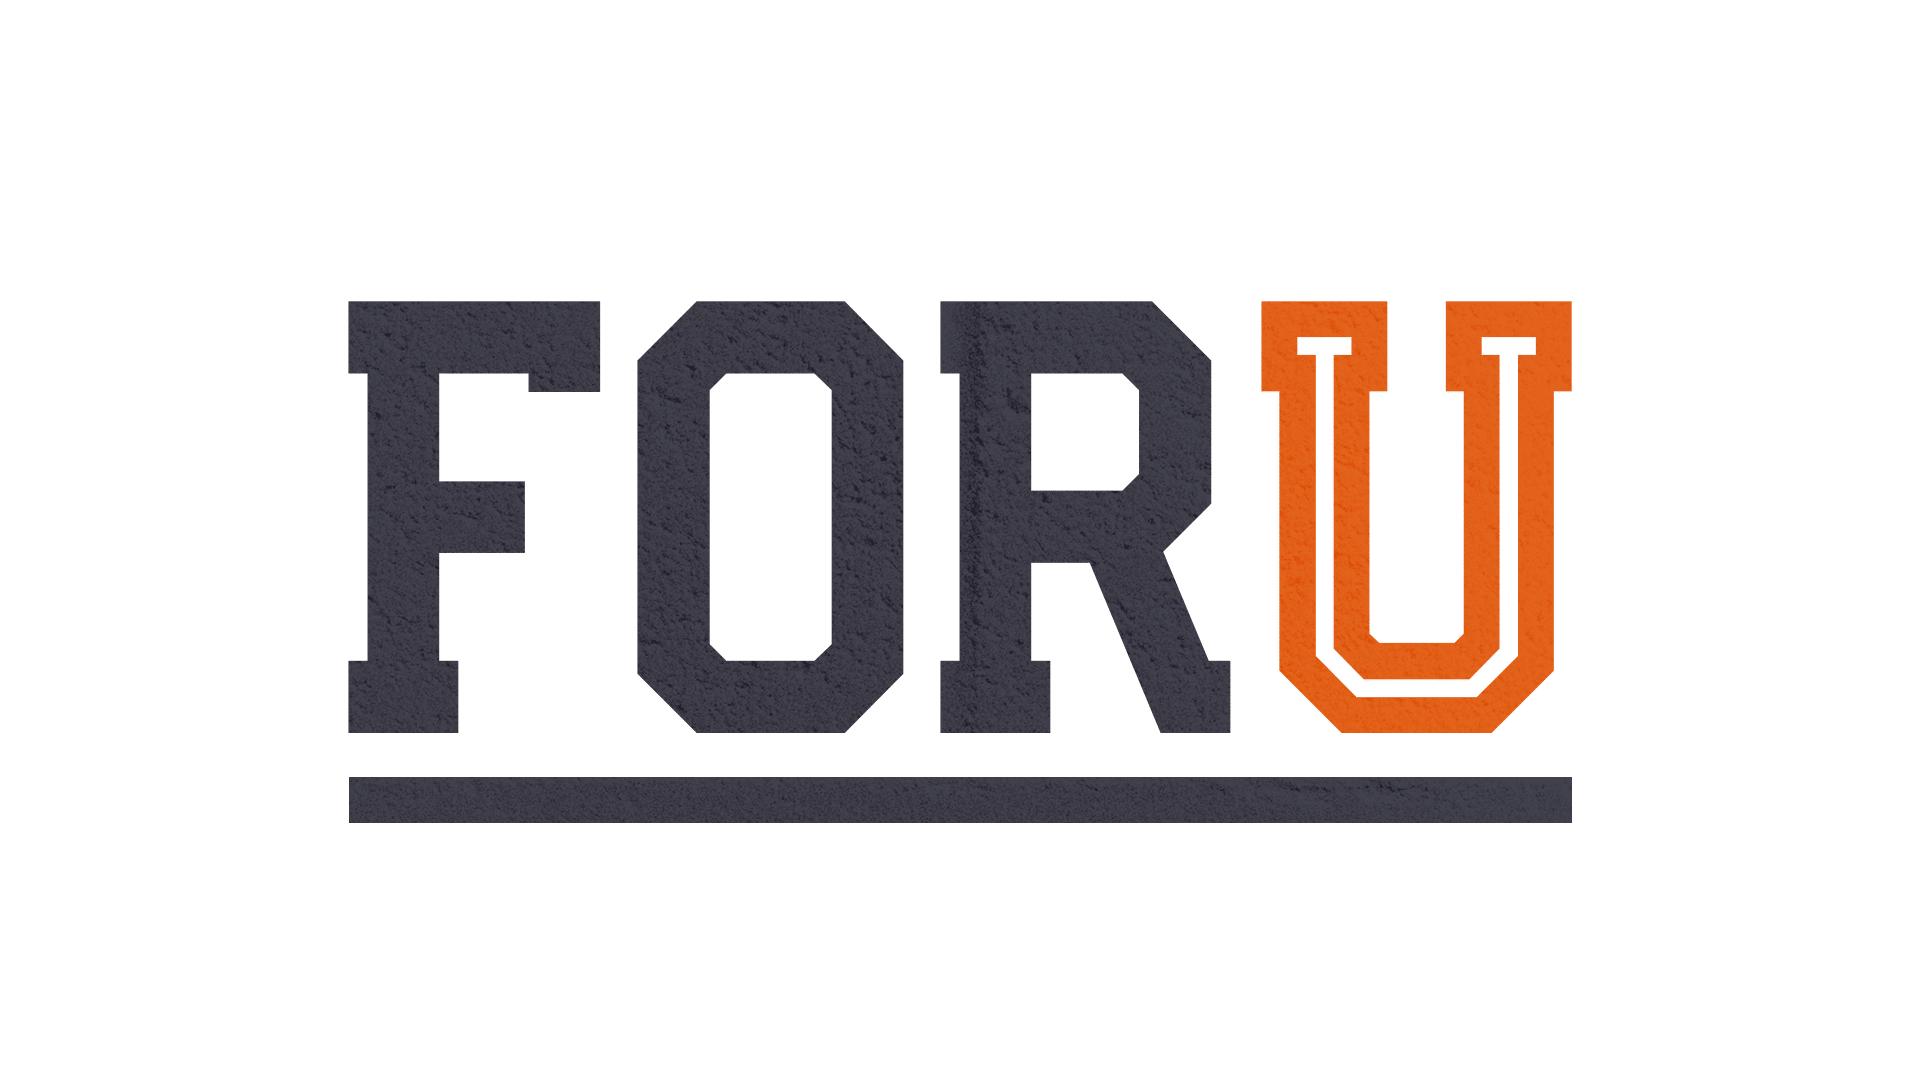 FORU_KeyArt_Title